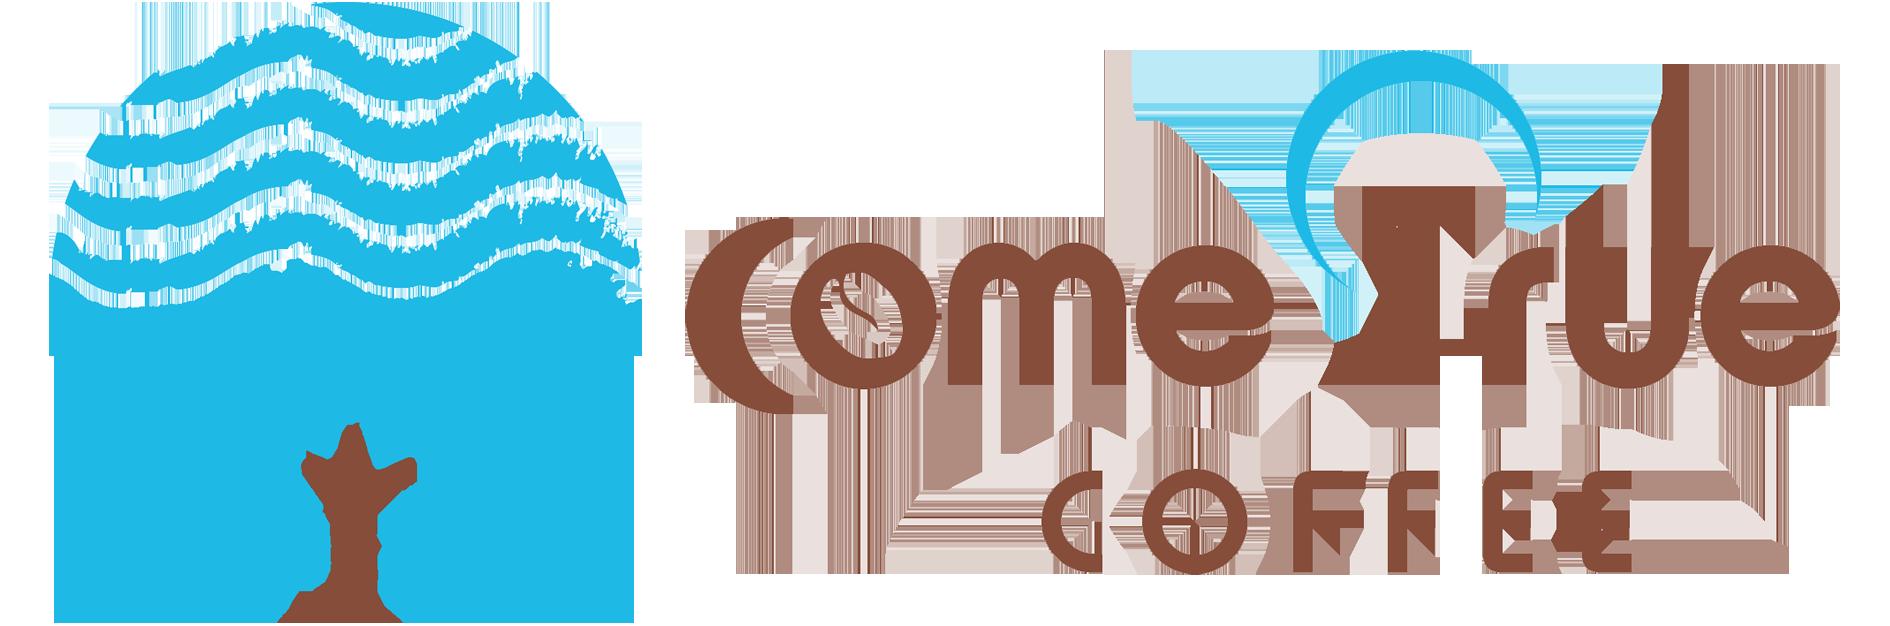 Come True Coffee - Certified B Corporation in Taiwan